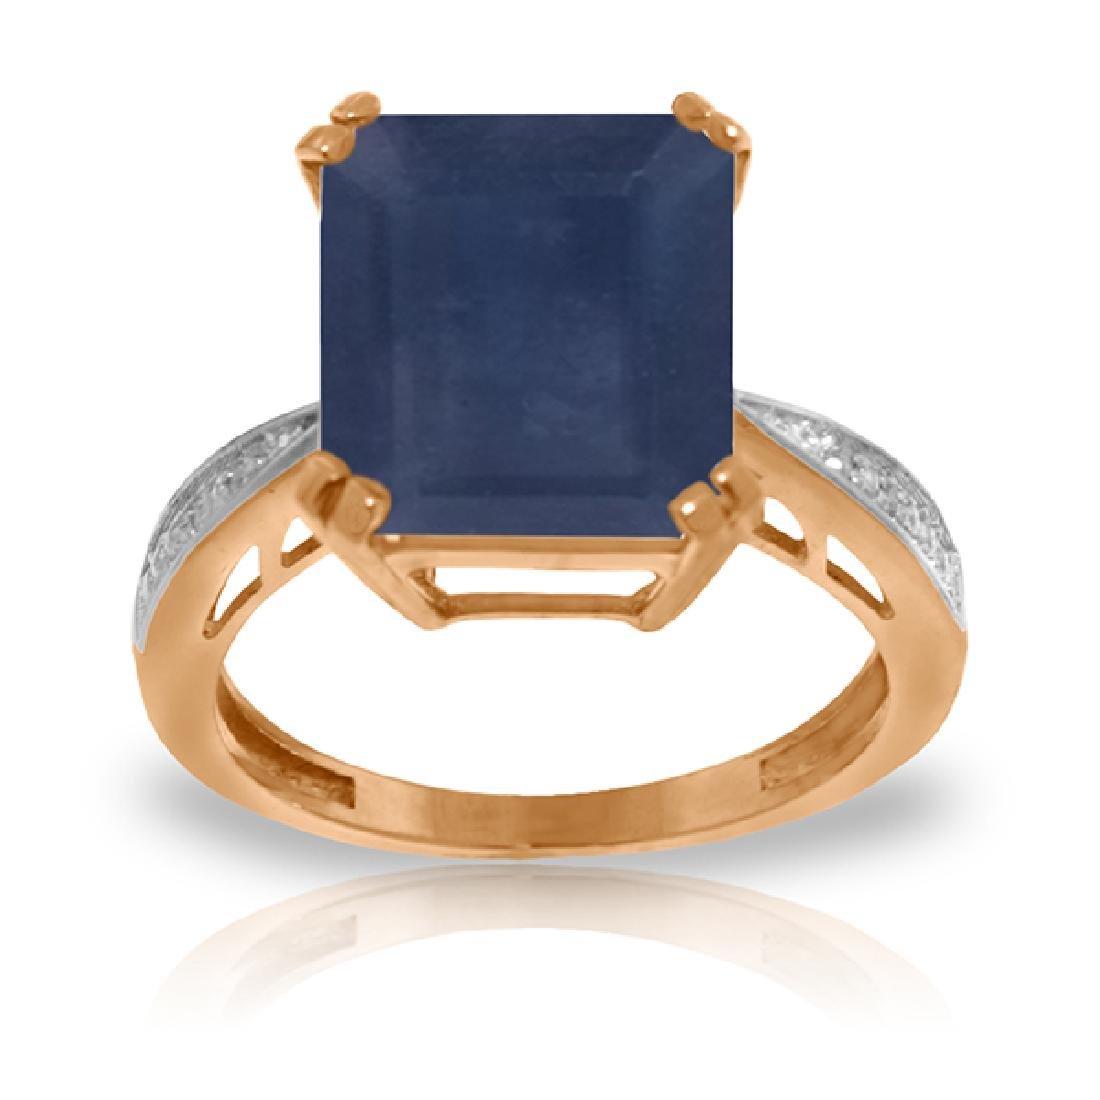 Genuine 7.27 ctw Sapphire & Diamond Ring Jewelry 14KT